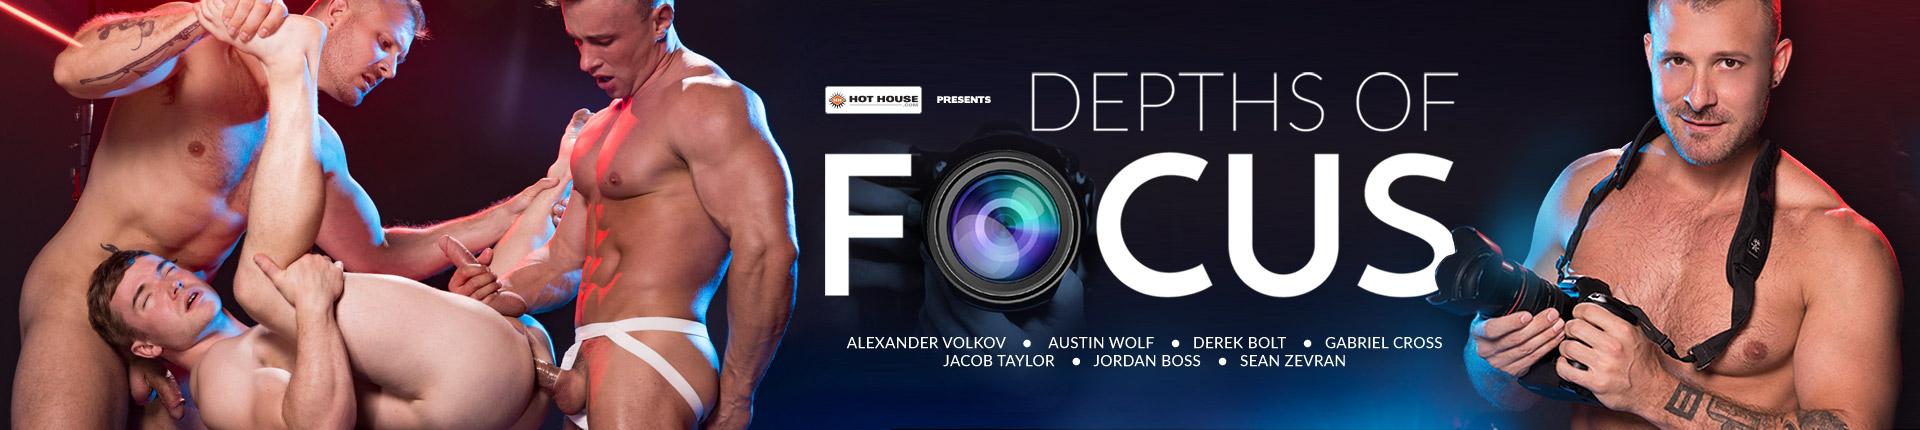 Depths_of_Focus